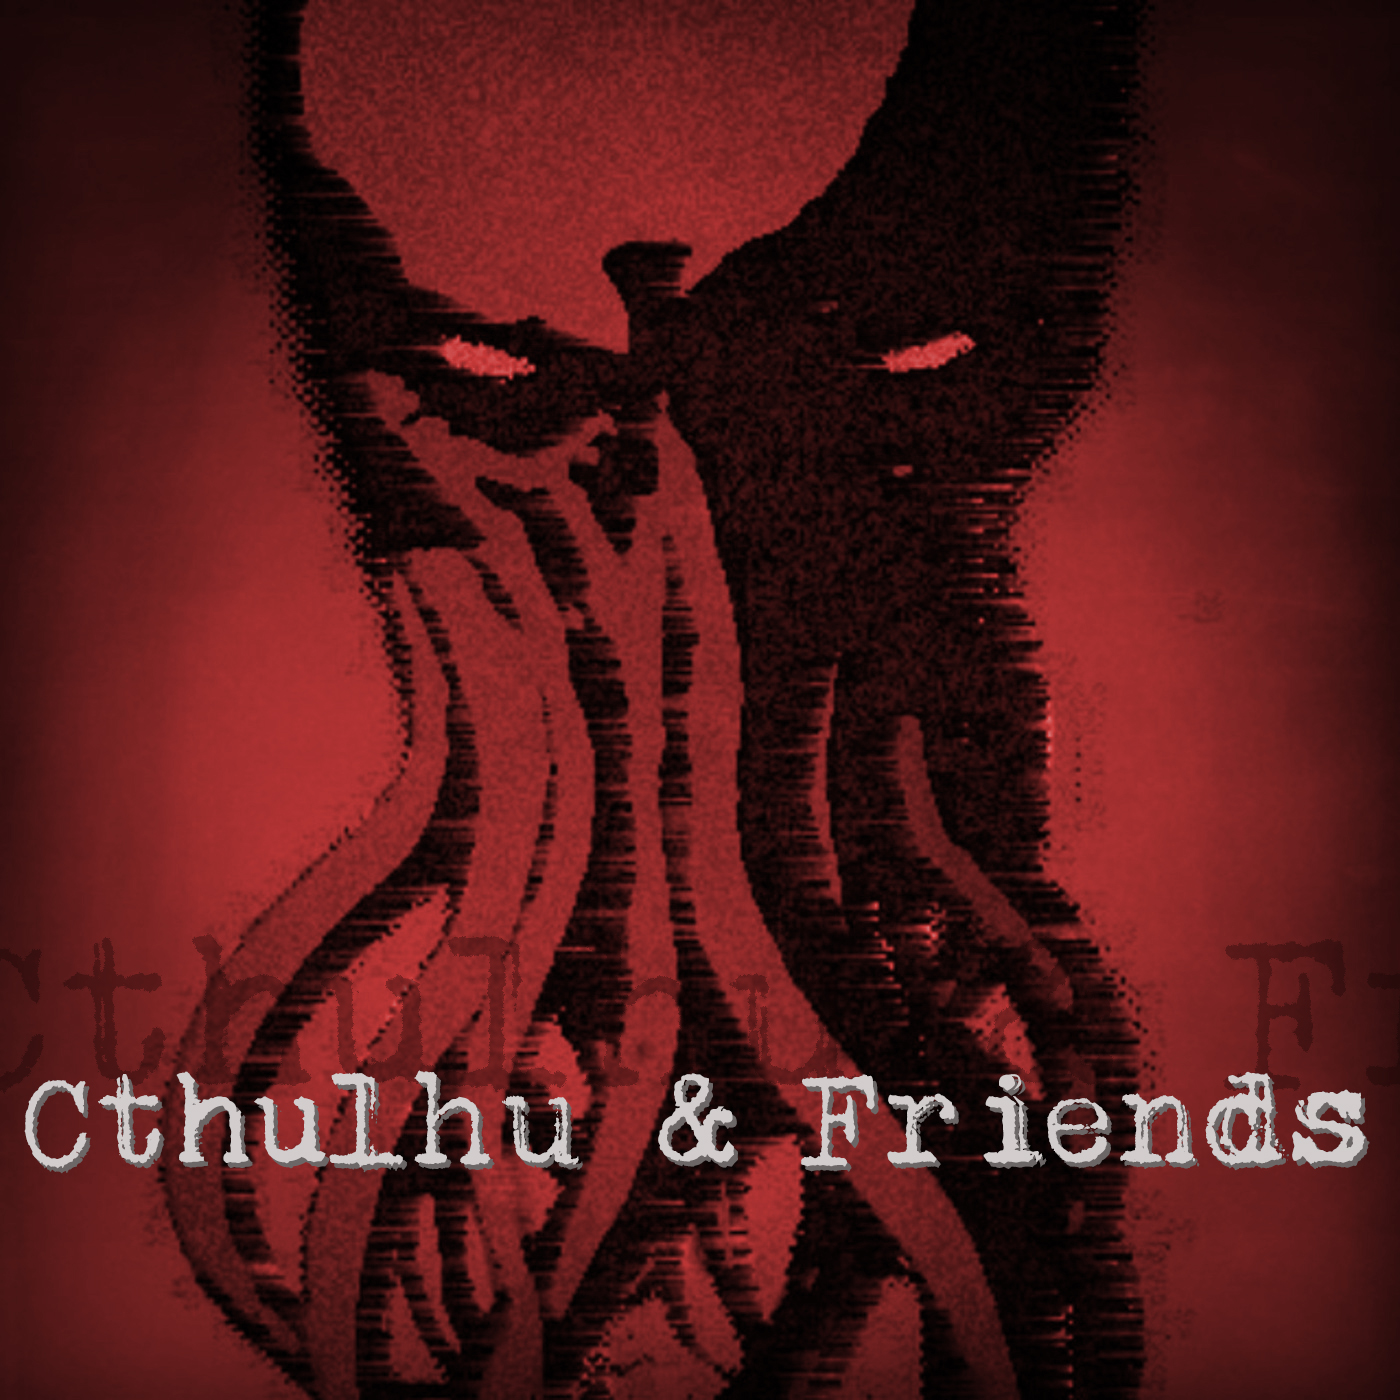 Cthulhu & Friends logo